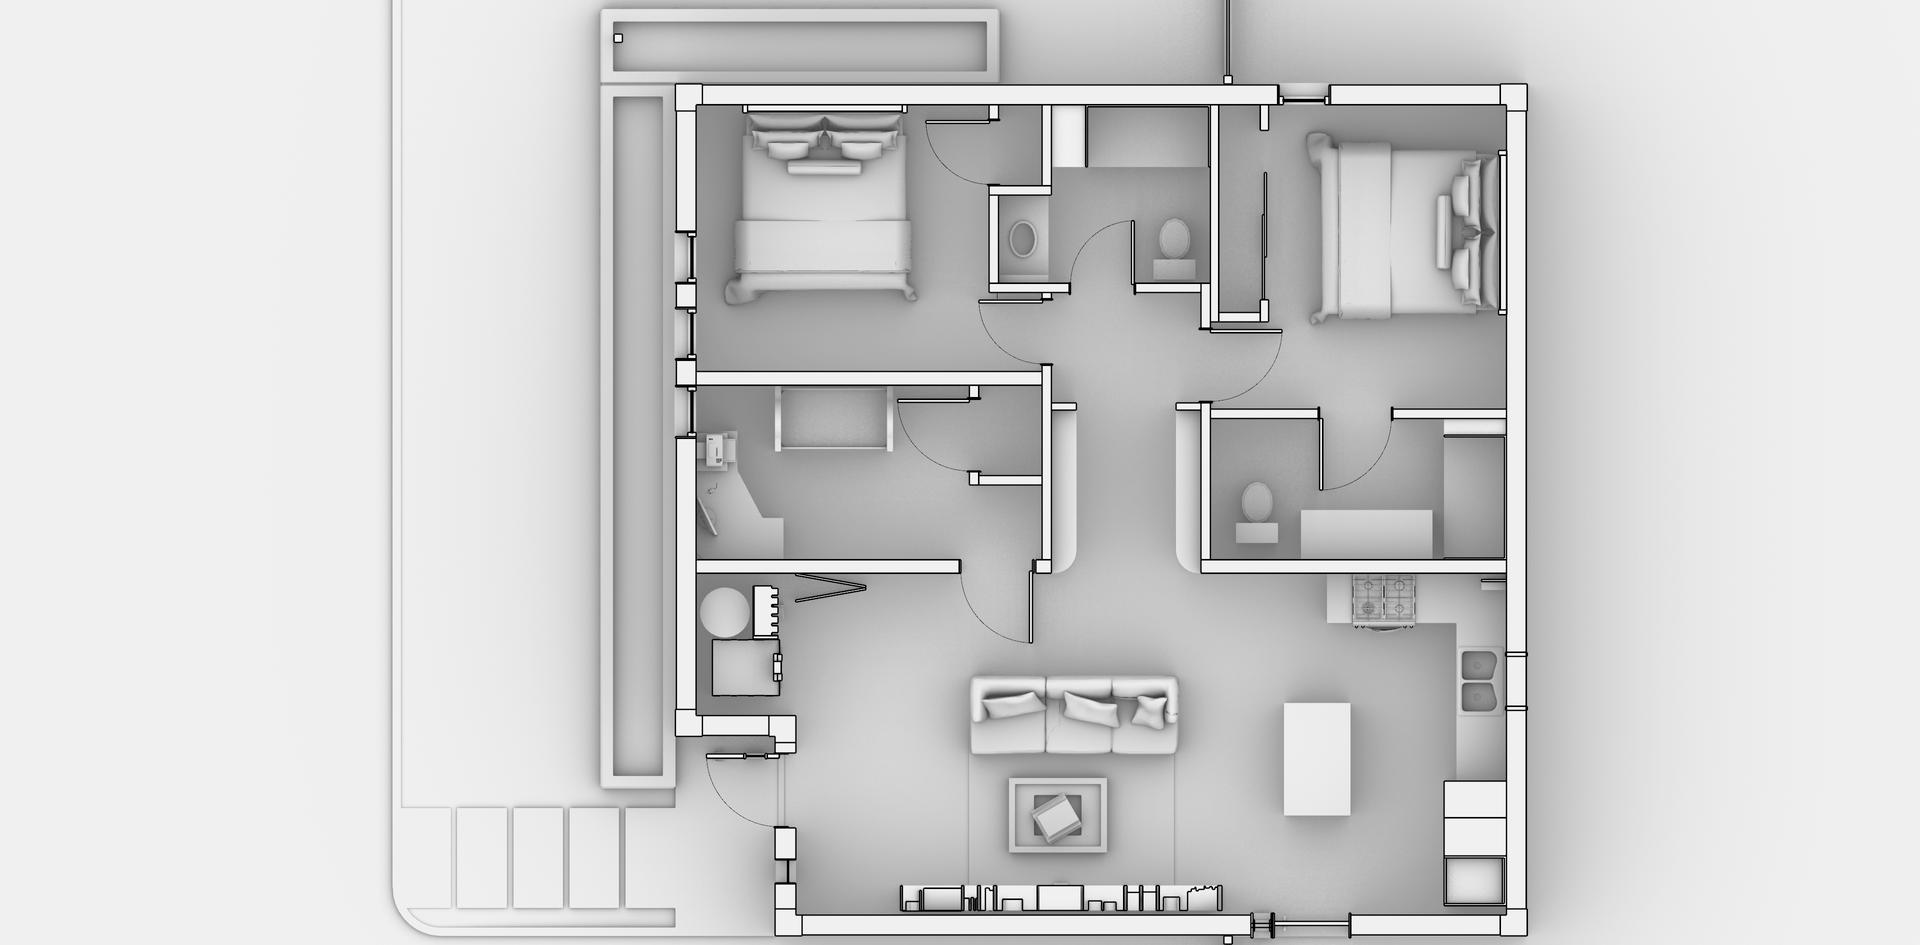 Medium Floorplan.png